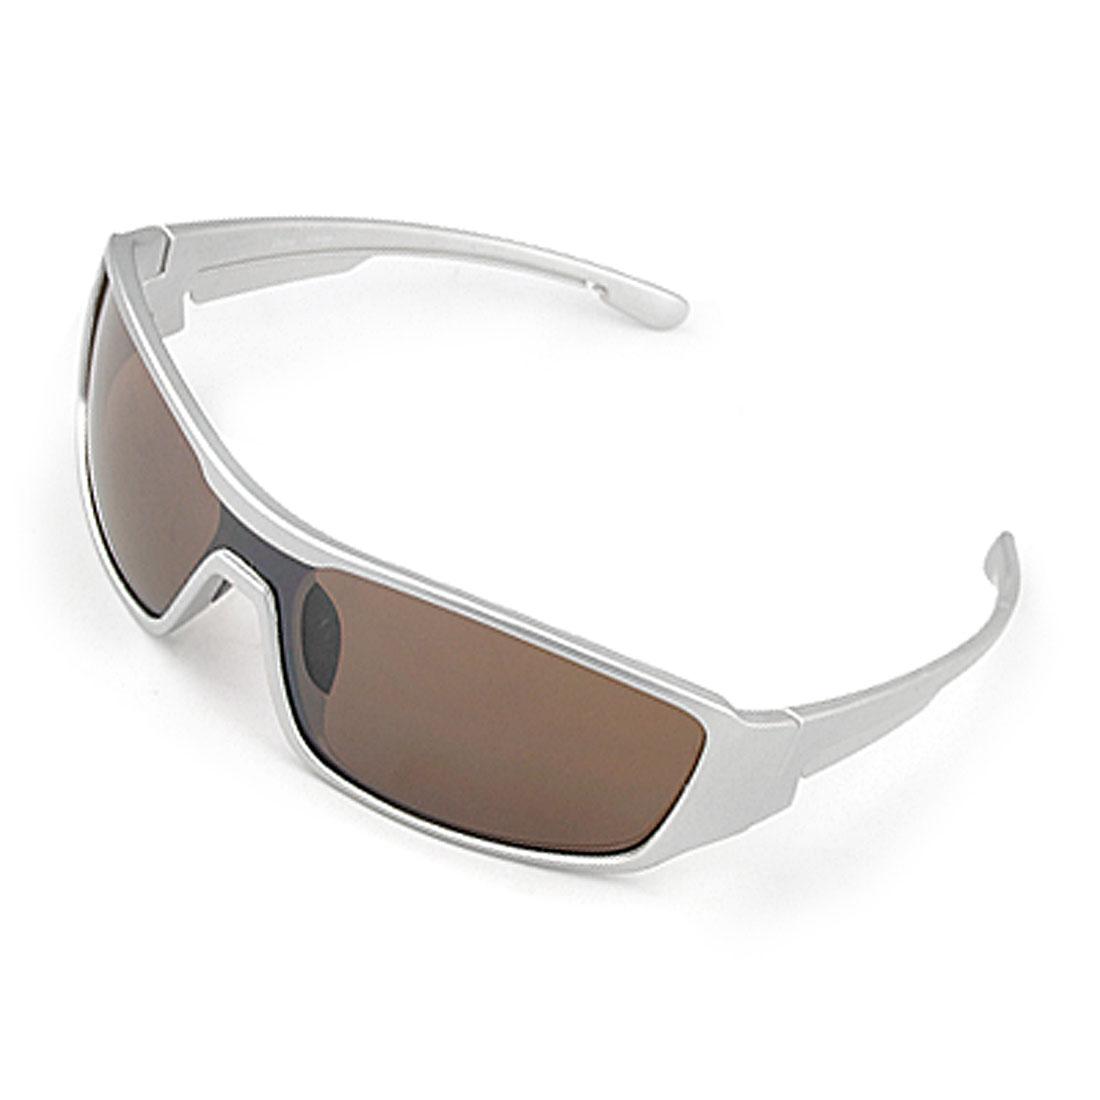 Black Nose Pad Silver Tone Plastic Frame Big Lens Unisex Sunglasses